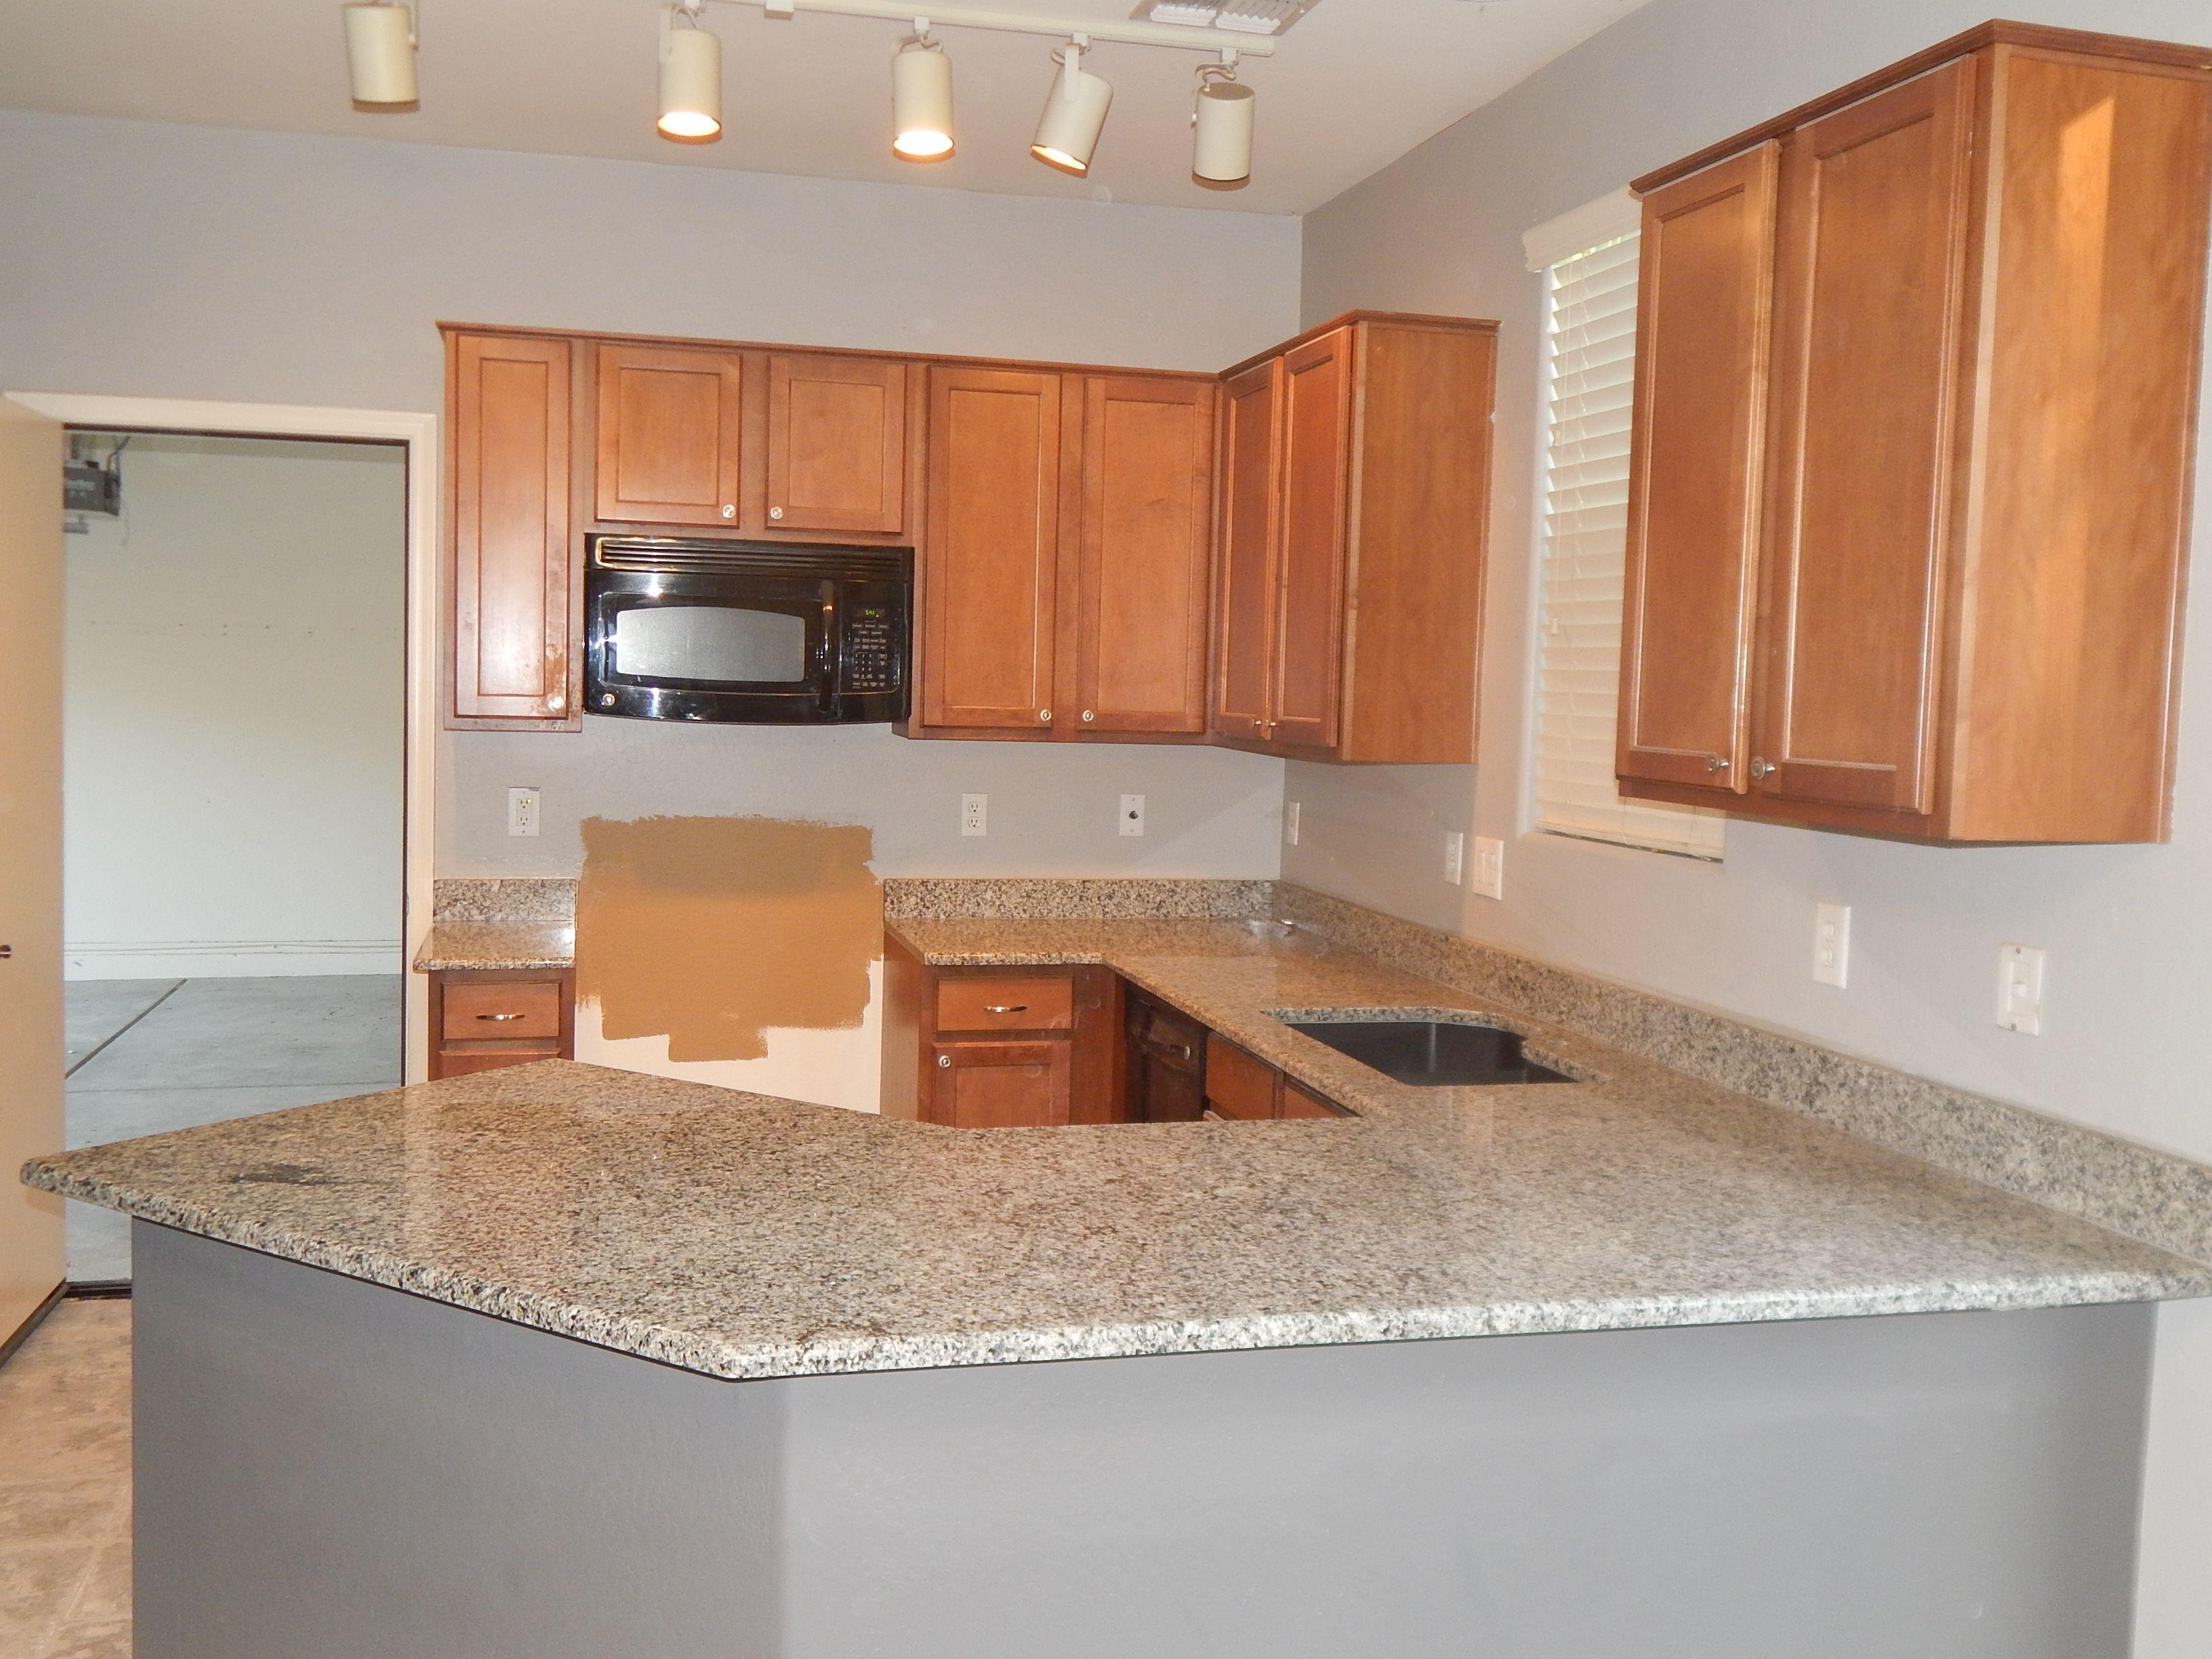 Kitchen remodel with Azul Platino granite and top radius edge